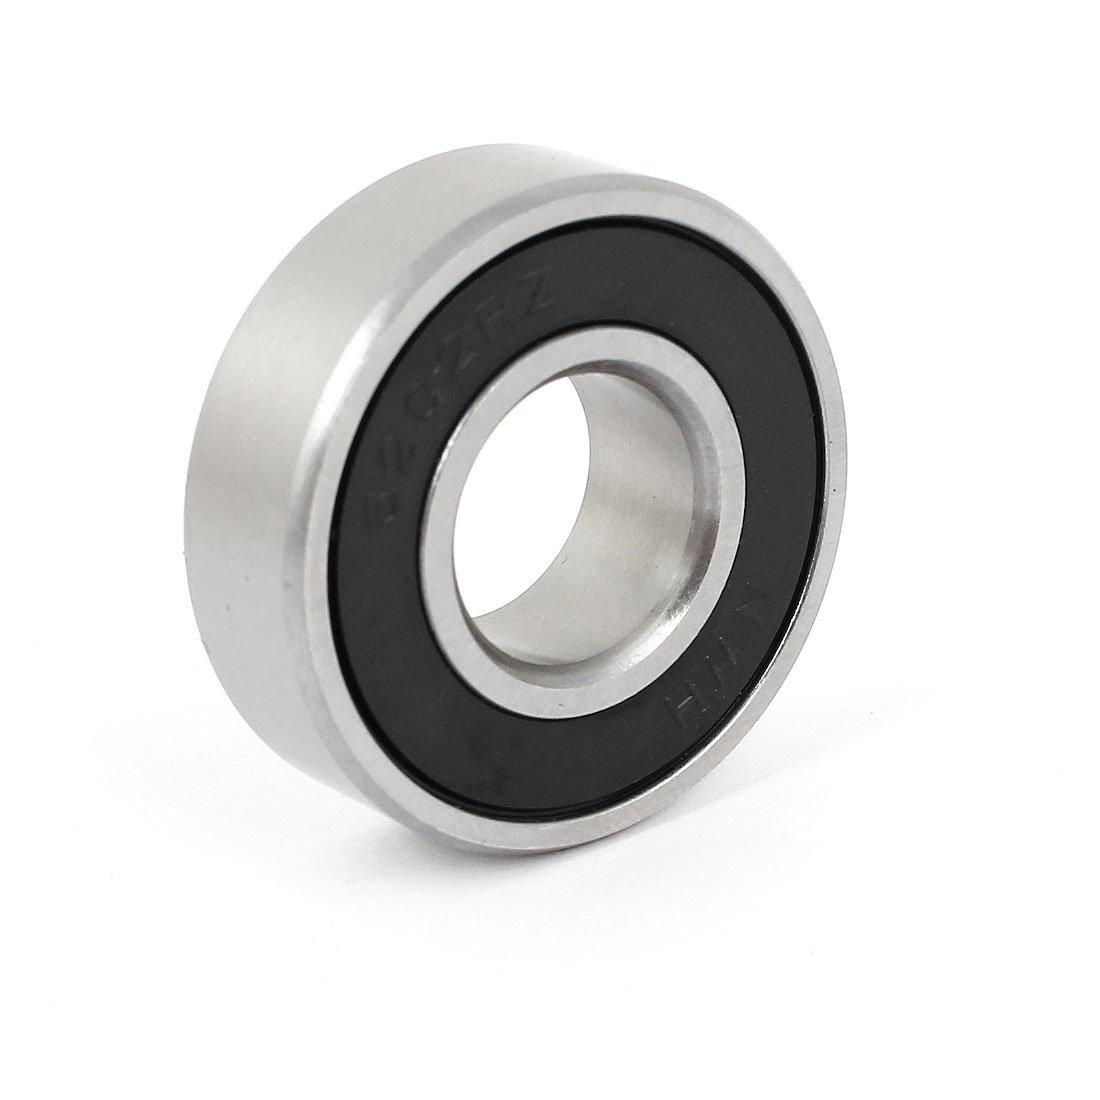 sourcingmap® 6202RZ 15 x 35 x 11 mm Silver Tone Single Row Shielded Deep Groove Ball Bearing a14111900ux0235